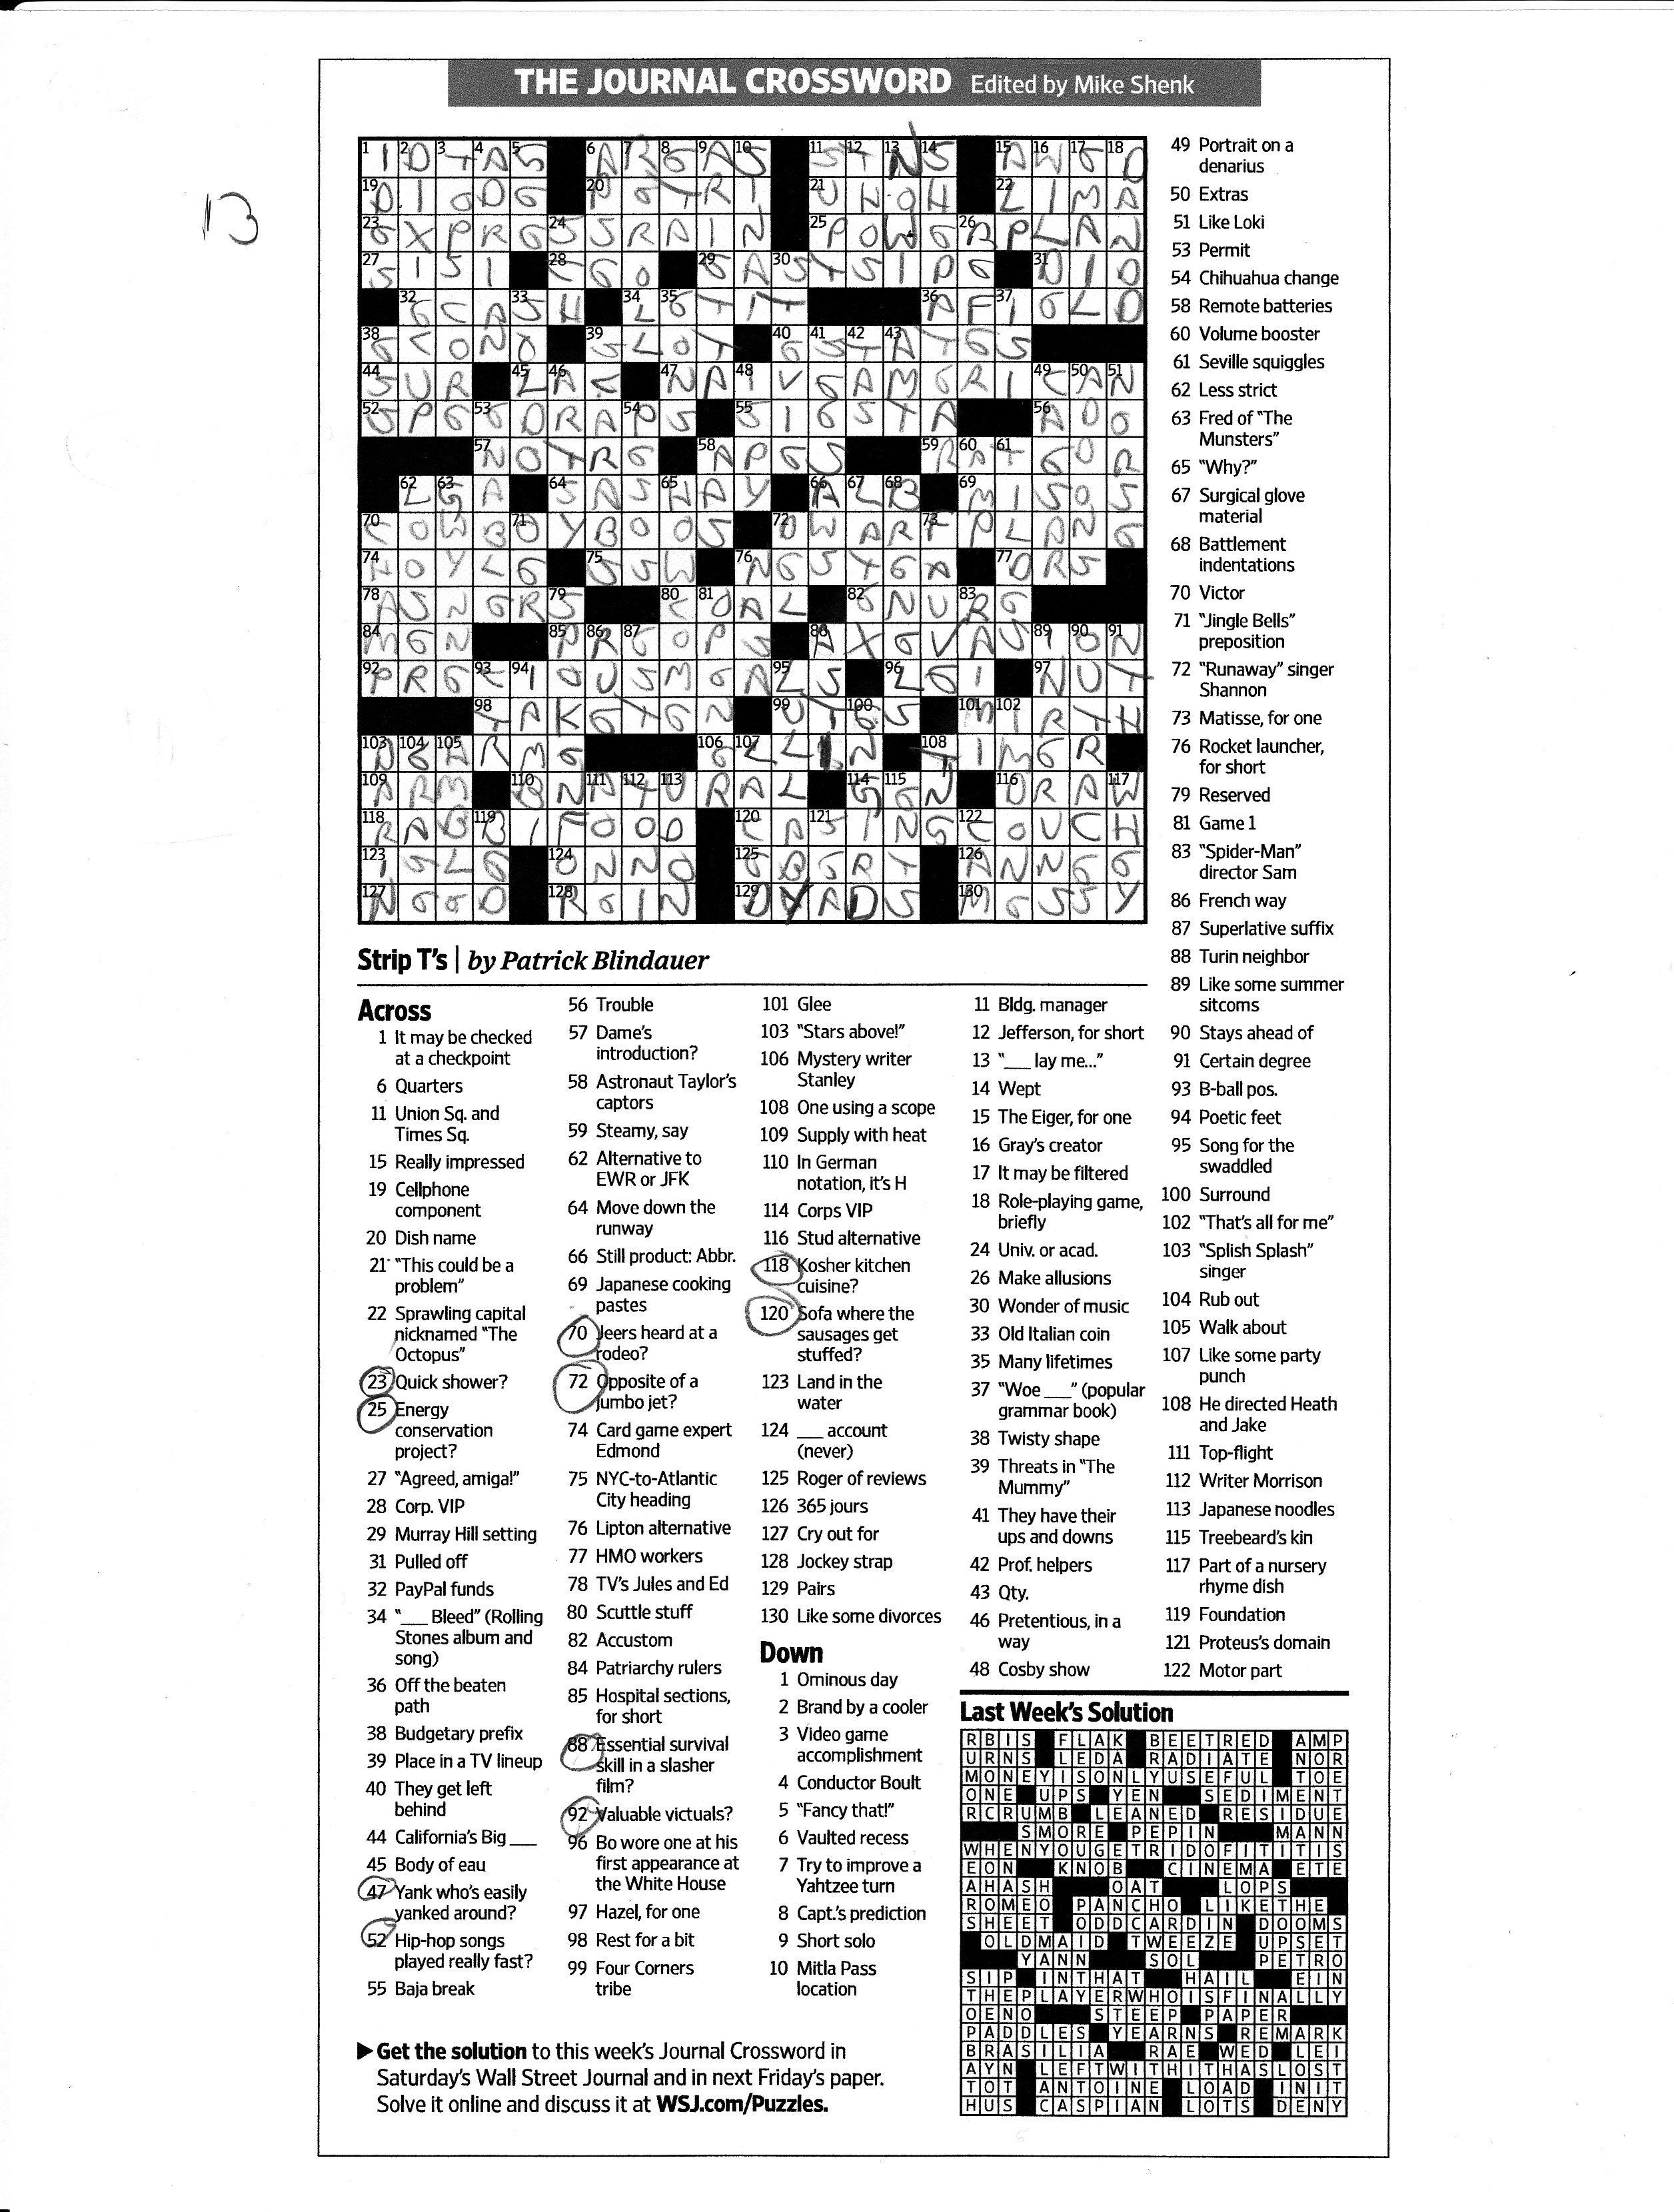 wall street journal crossword puzzles crossword puzzles on wall street journal crossword id=43134